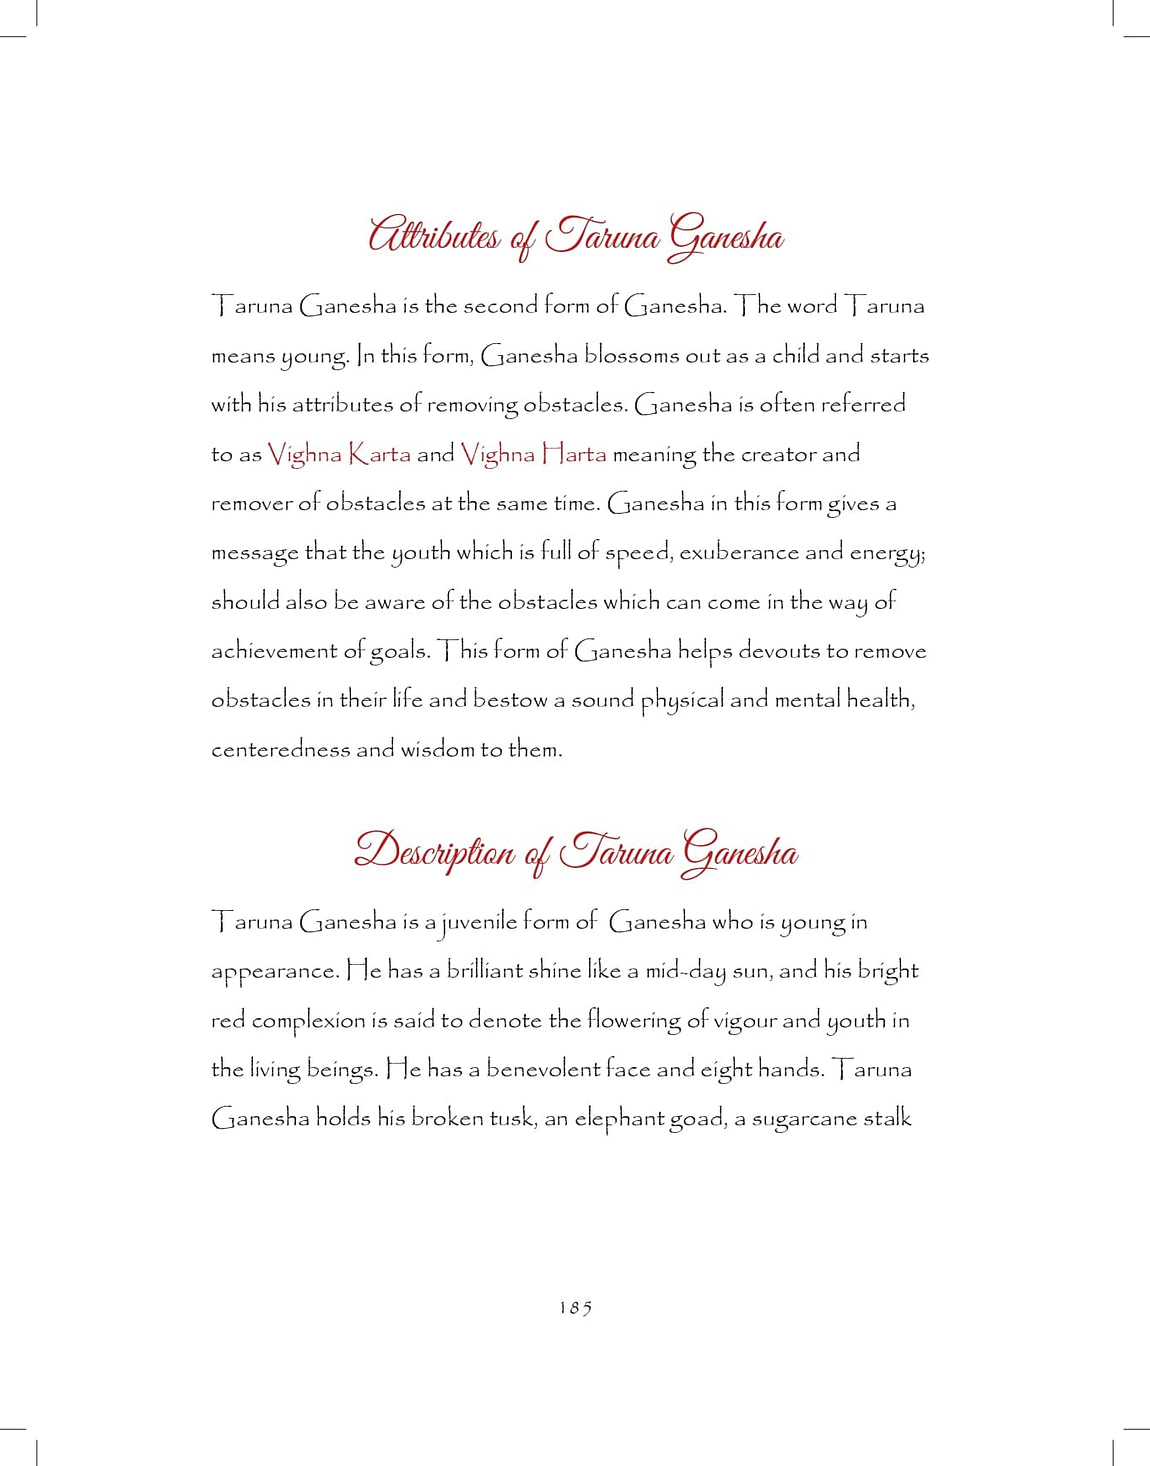 Ganesh-print_pages-to-jpg-0185.jpg